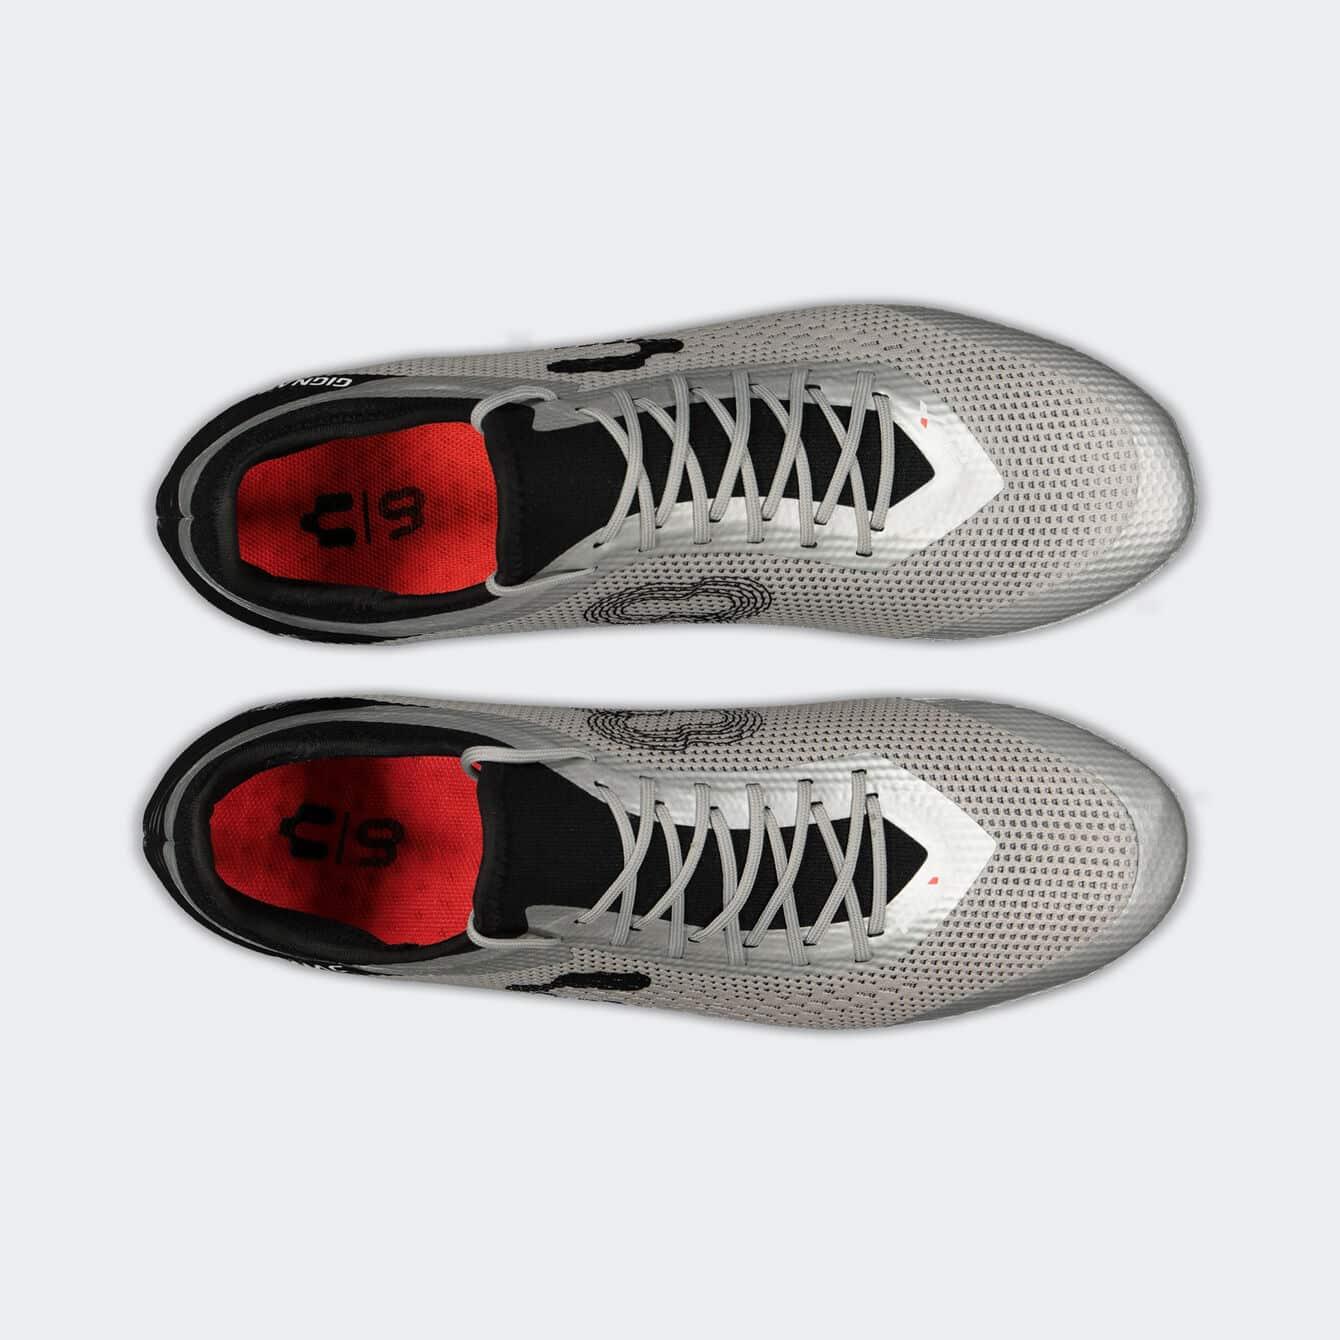 chaussures-andre-pierre-gignac-charly-futbol-pfx-3